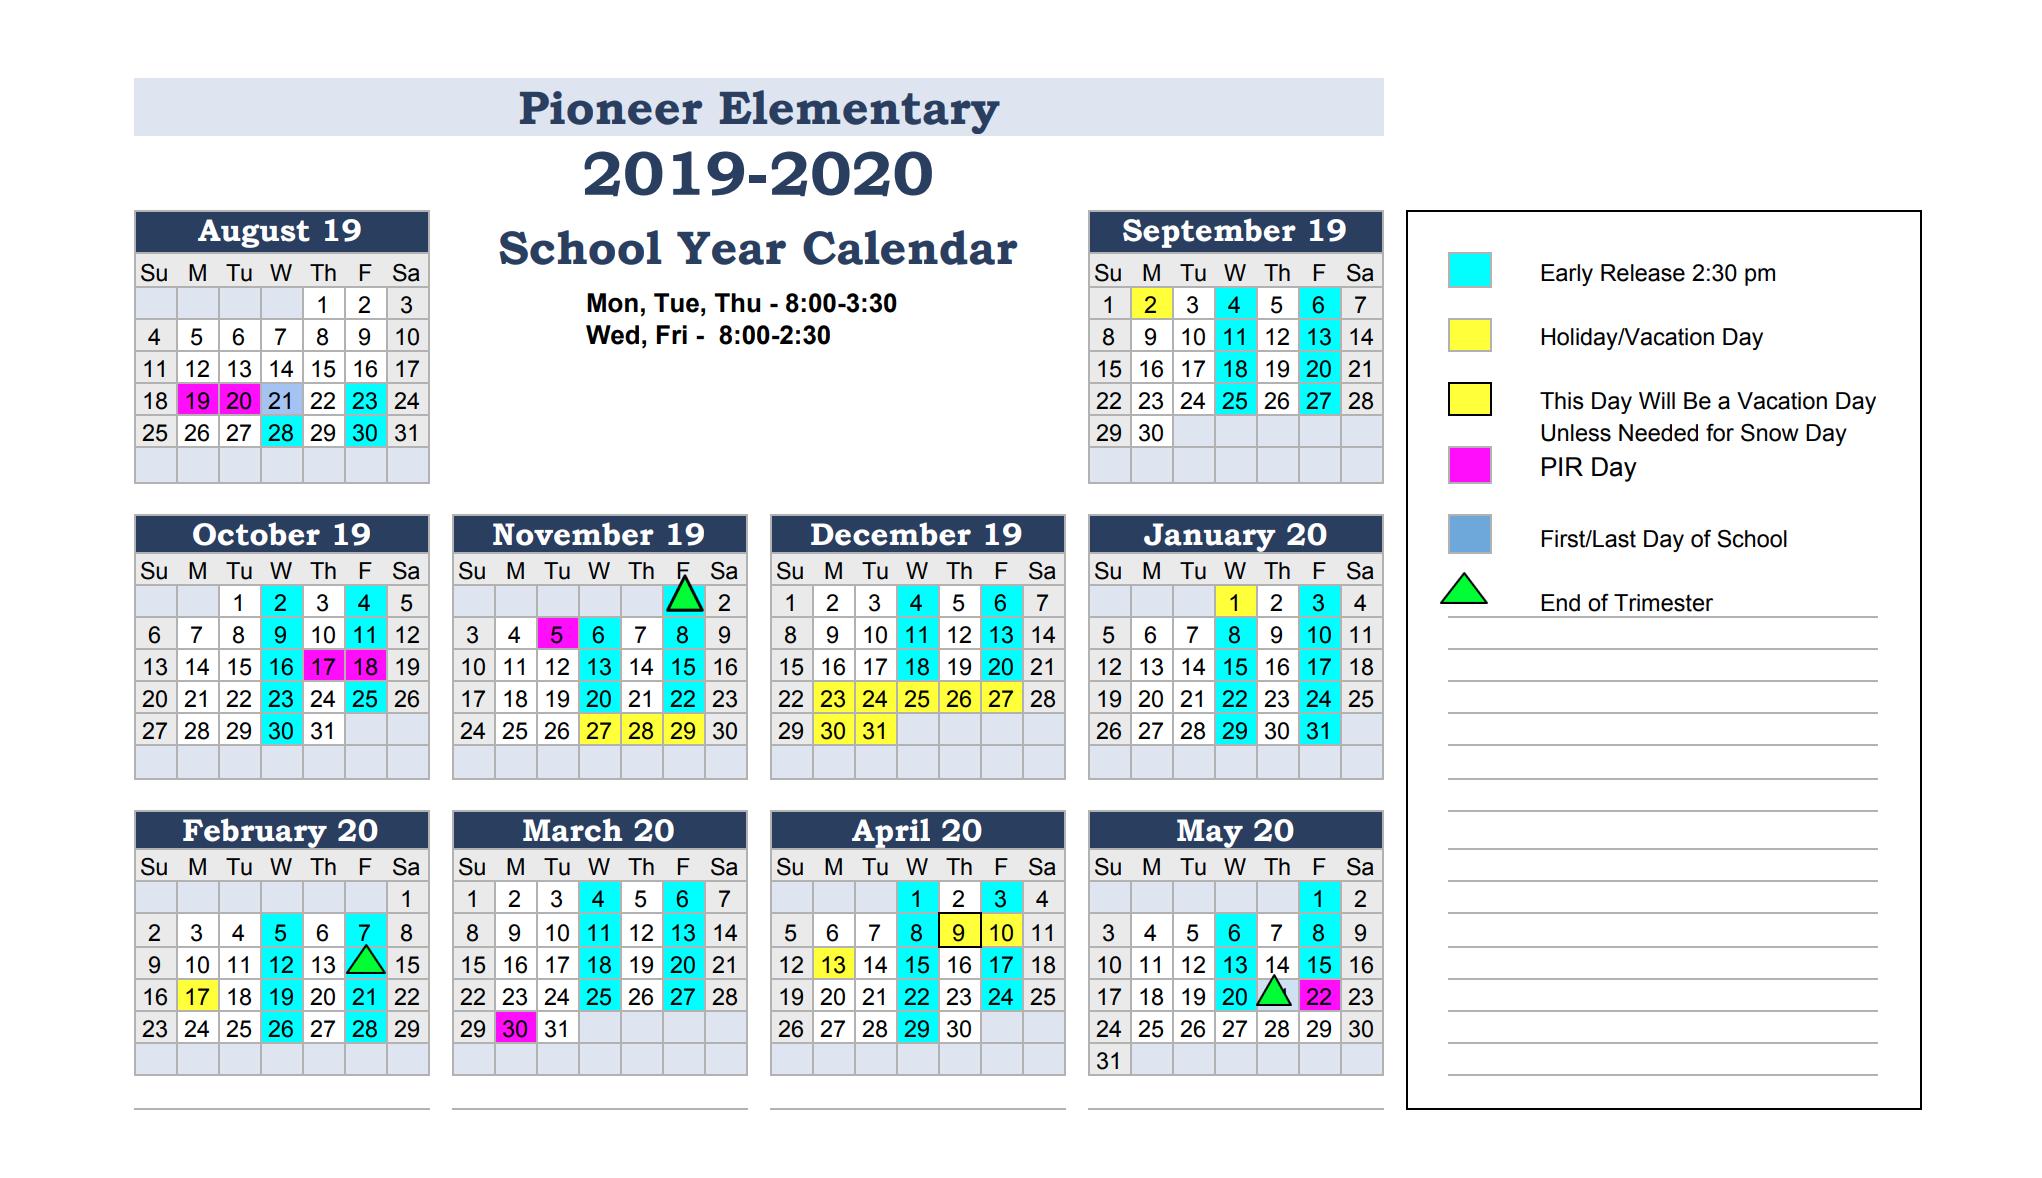 Calendar & Events - Pioneer Elementary School Inside Billings School Distric 2 Calendar